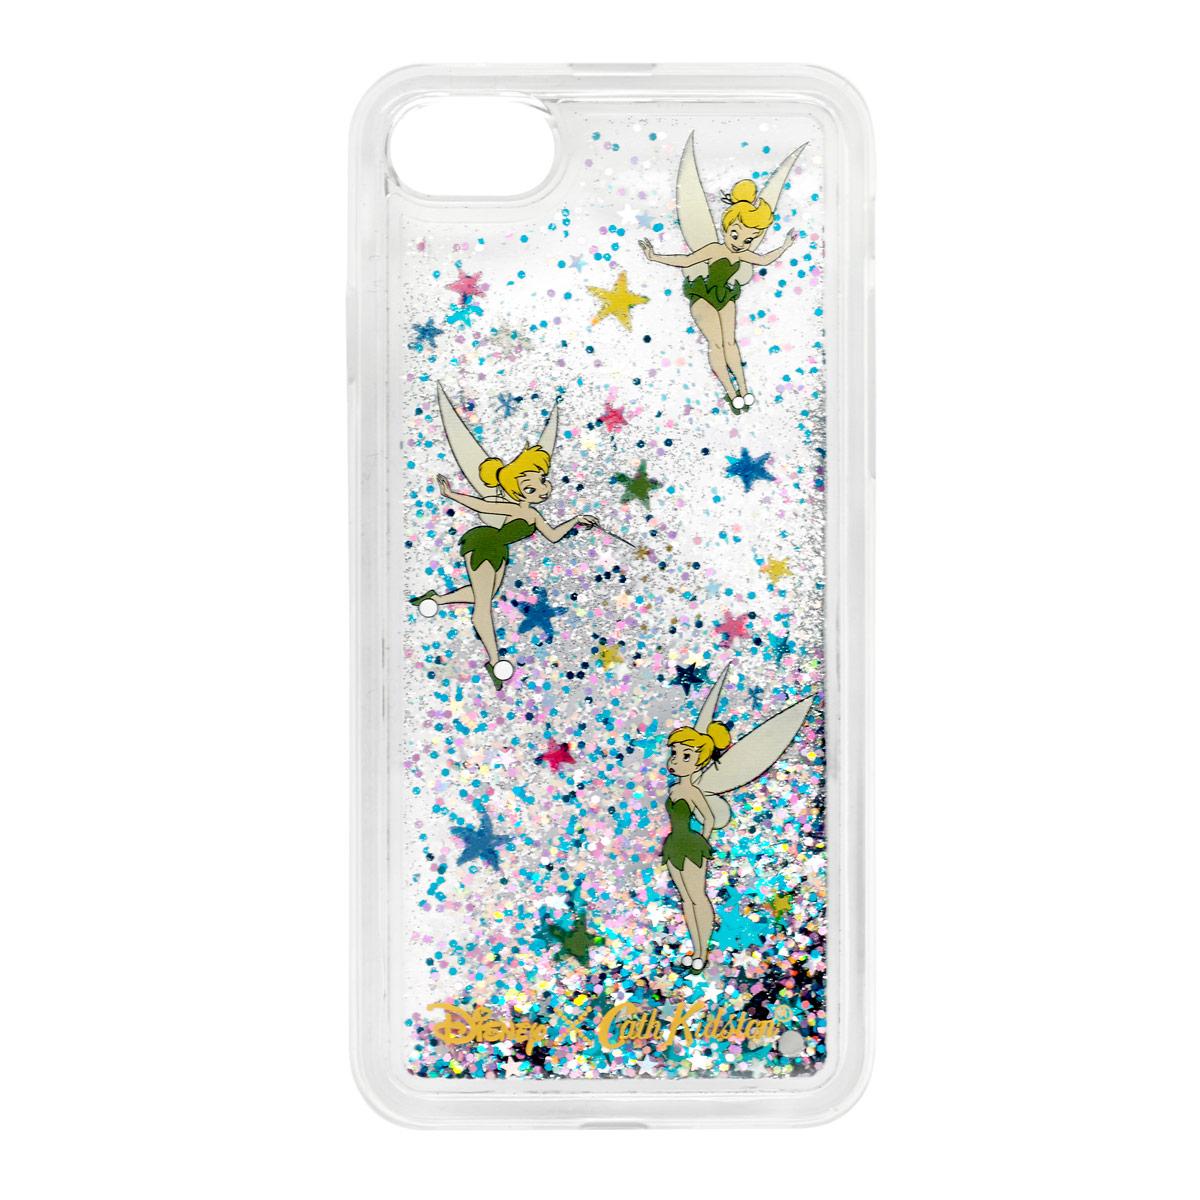 Cath Kidston Disney Tinker Bell Glitter I phone 7 case now £5 (free C&C)